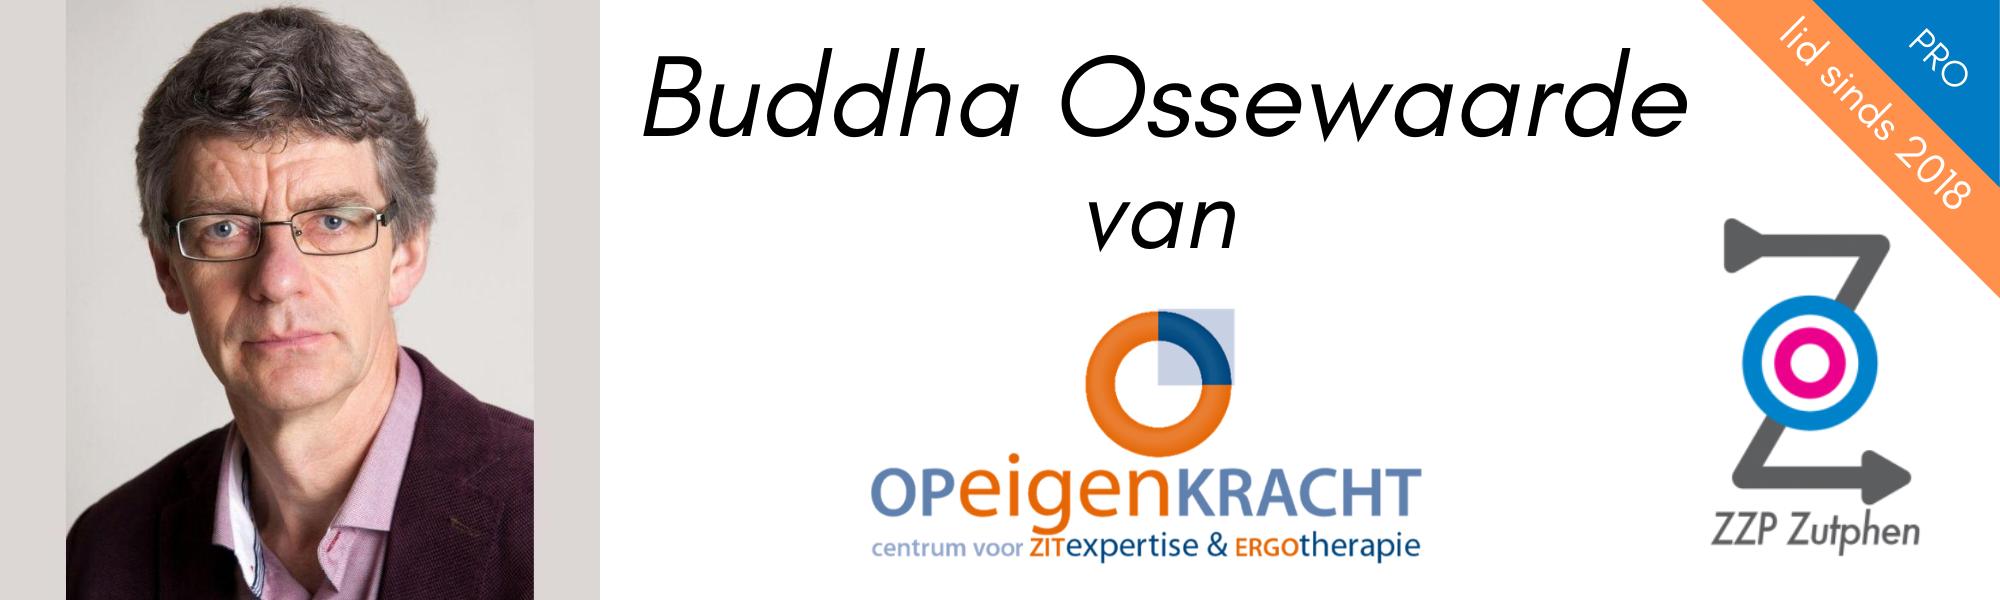 buddha-ossewaarde-op-eigen-kracht-zitexpertise-ergotherapie-zzpzutphen